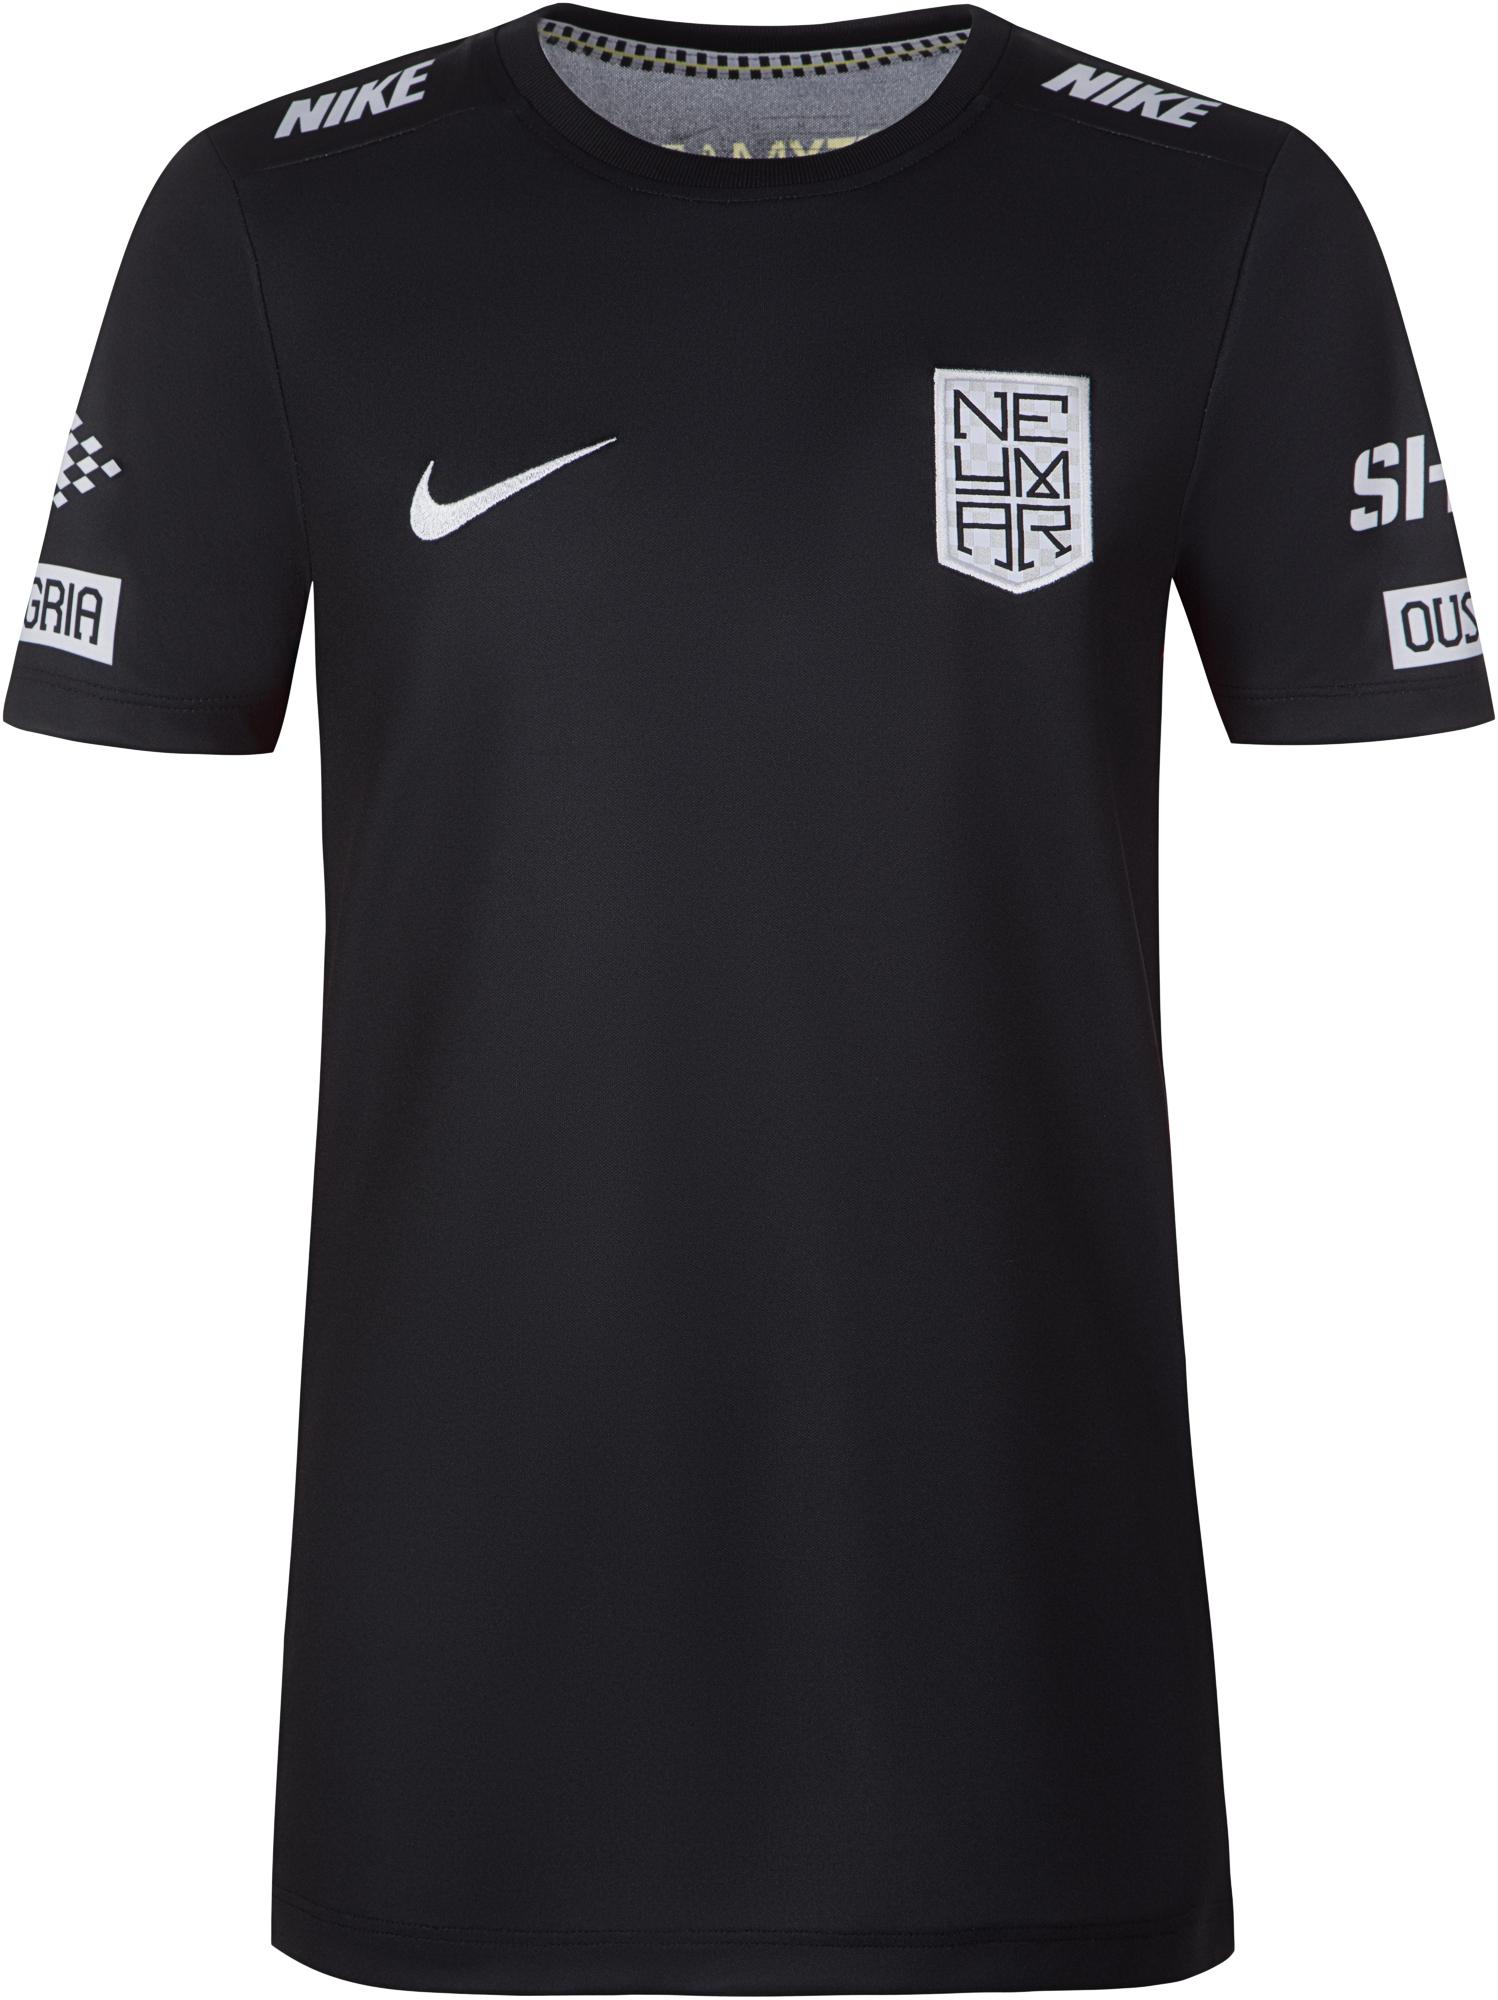 Nike Футболка для мальчиков Neymar Jr. Dry, размер 158-170